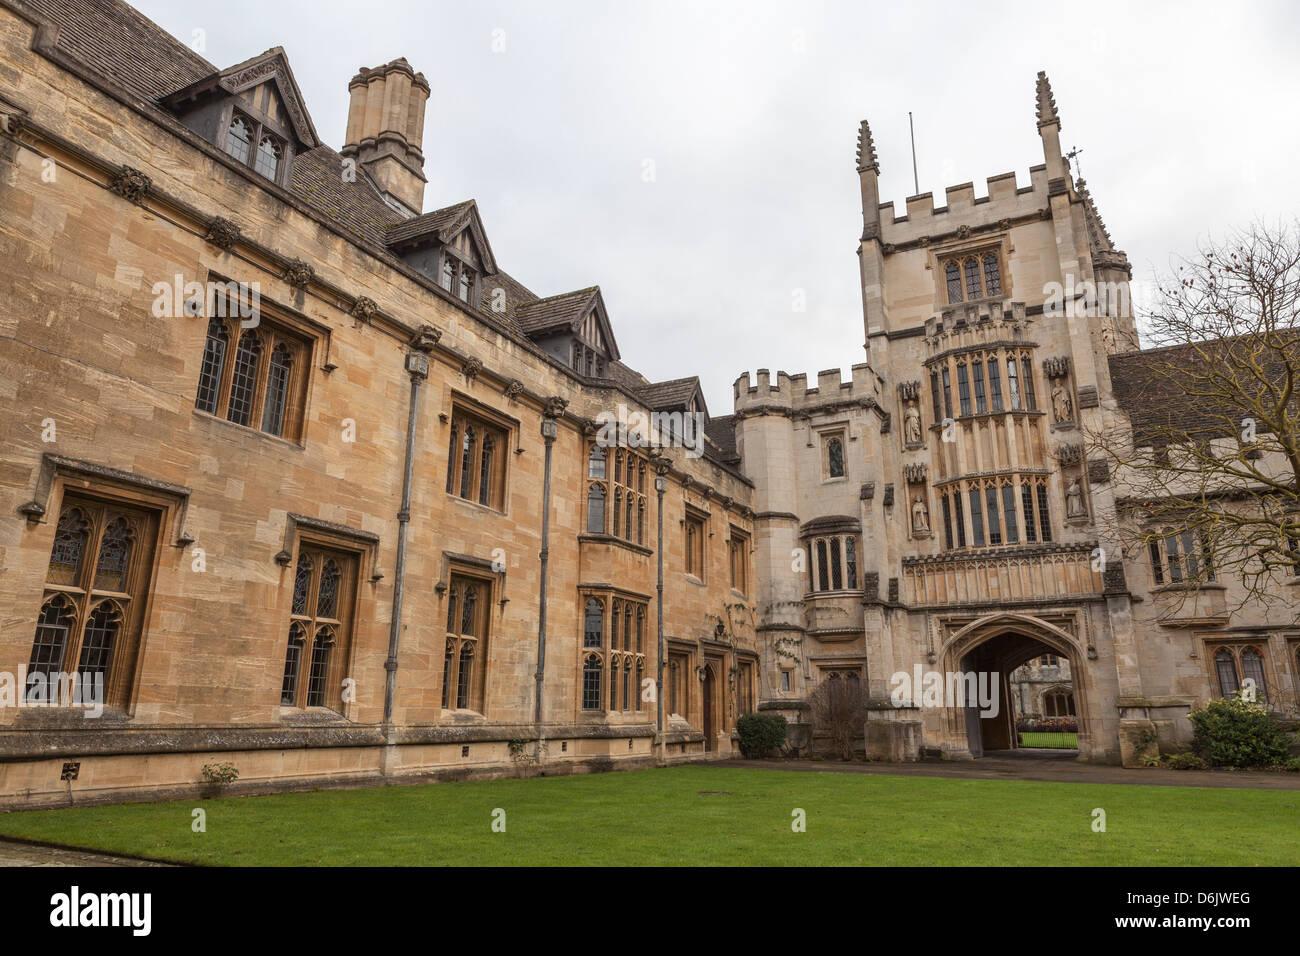 St. John's Quad, Magdalen College, Oxford, Oxfordshire, England, United Kingdom, Europe Stock Photo